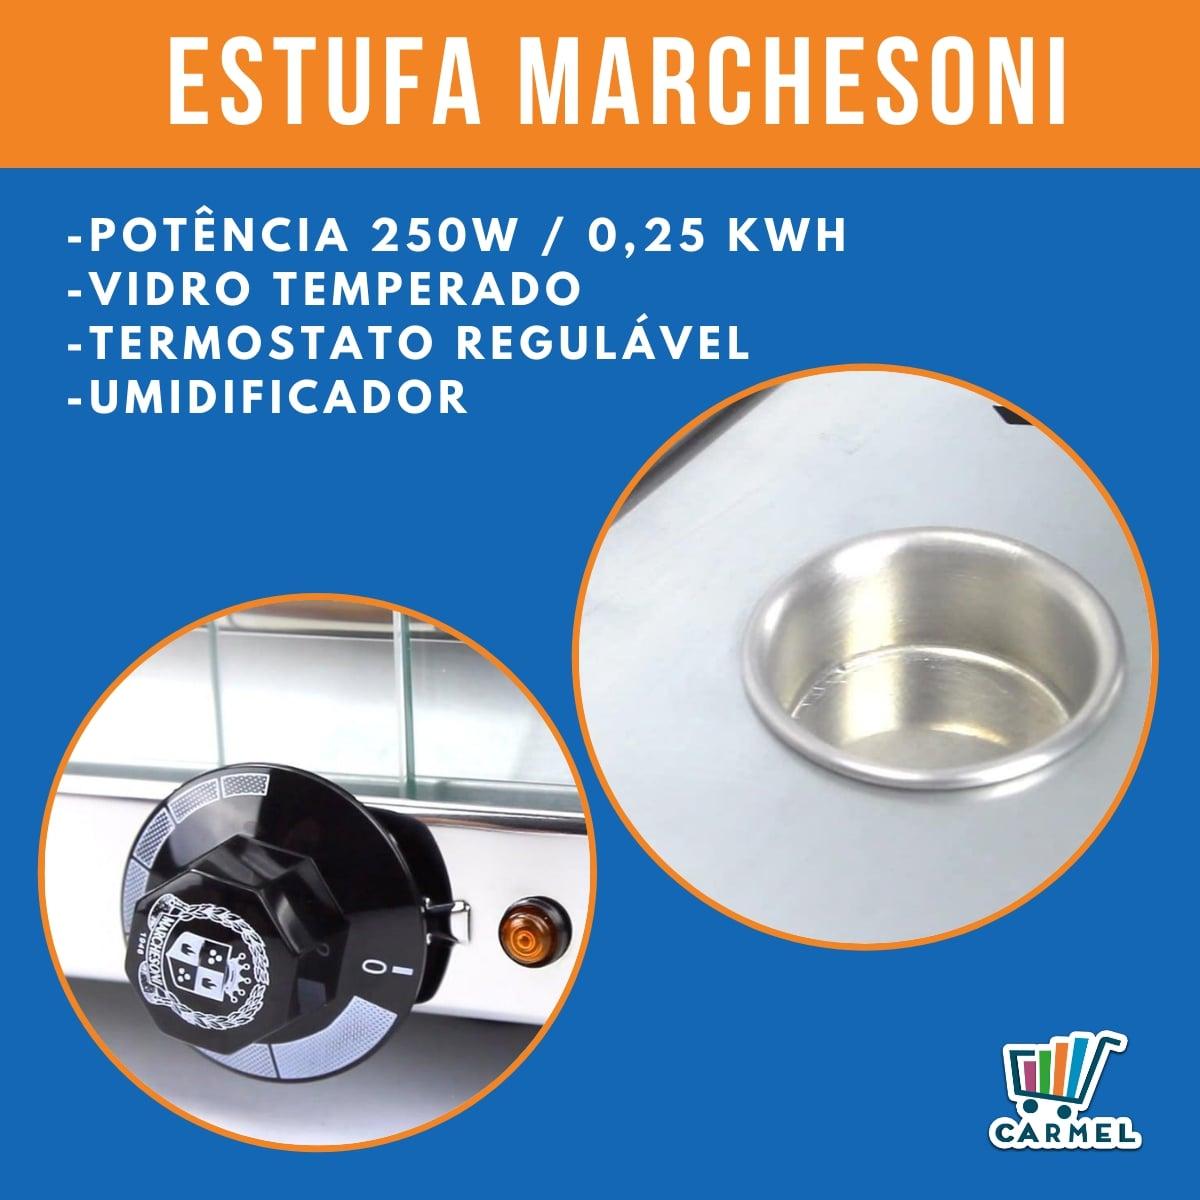 Estufa Para Salgados Dupla Marchesoni 10 Bandejas Linha Ouro - Ef2211/212  - Carmel Equipamentos